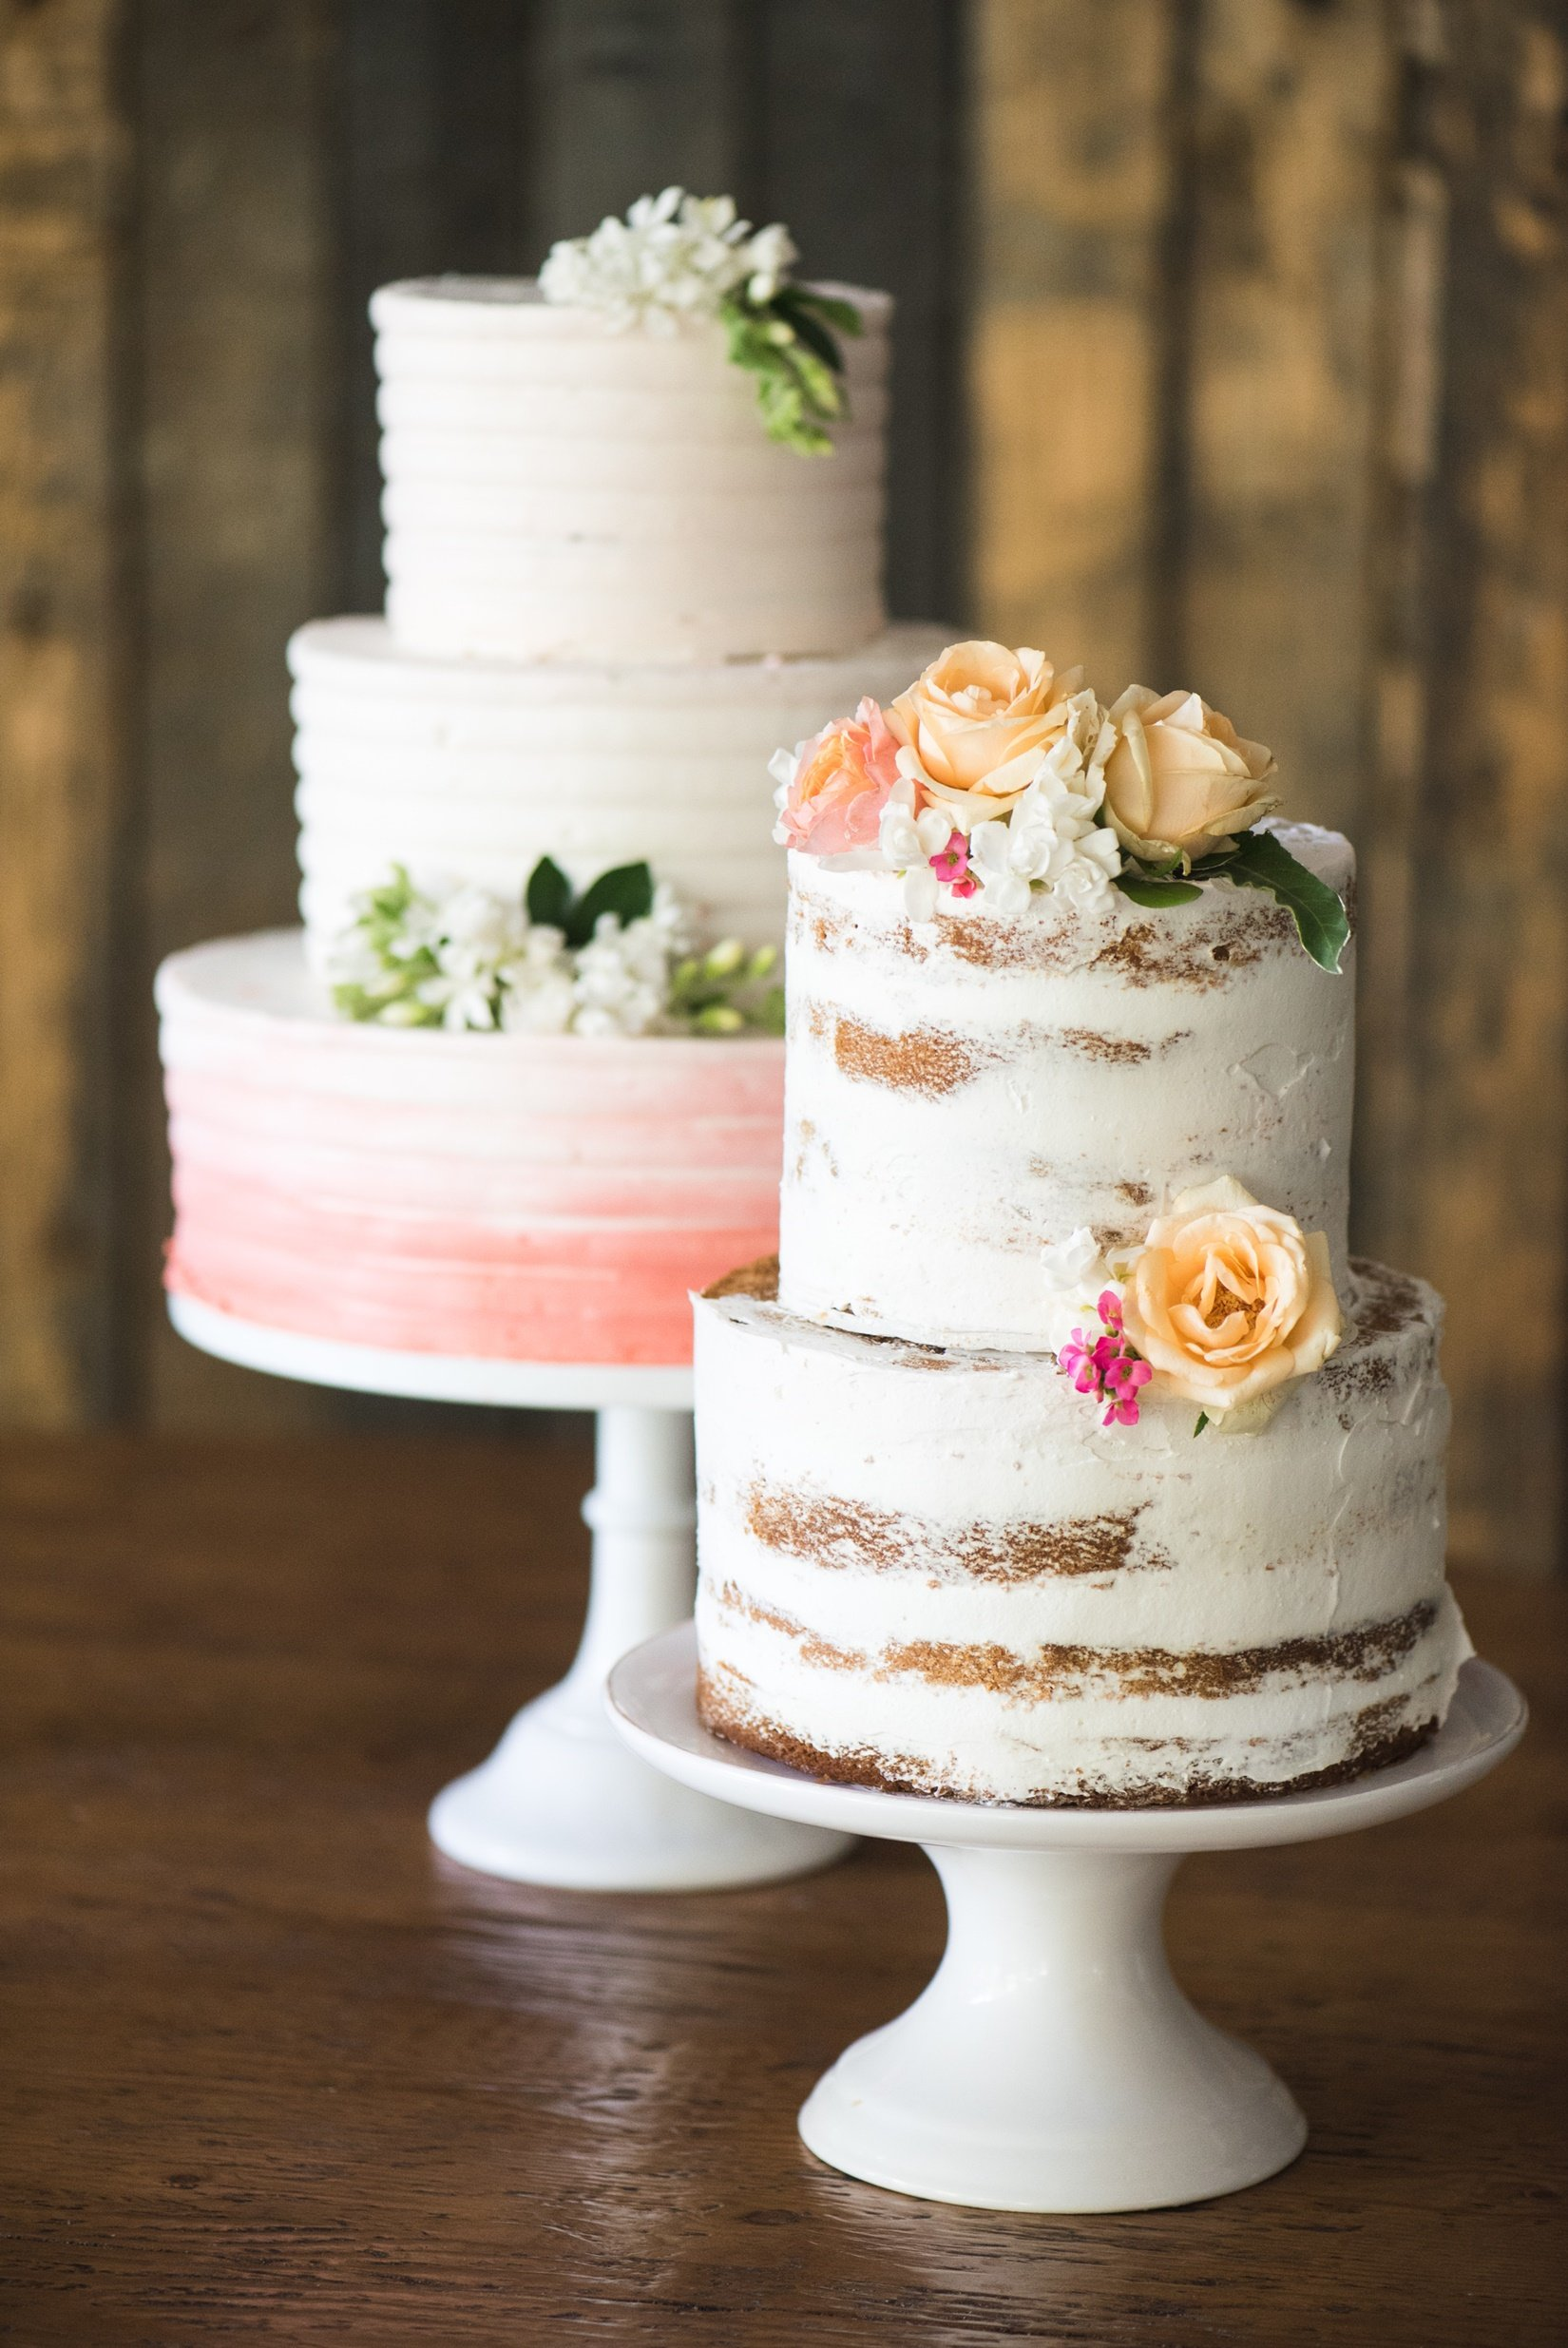 Winter Blossom: חתונות חורף בגן ורדים